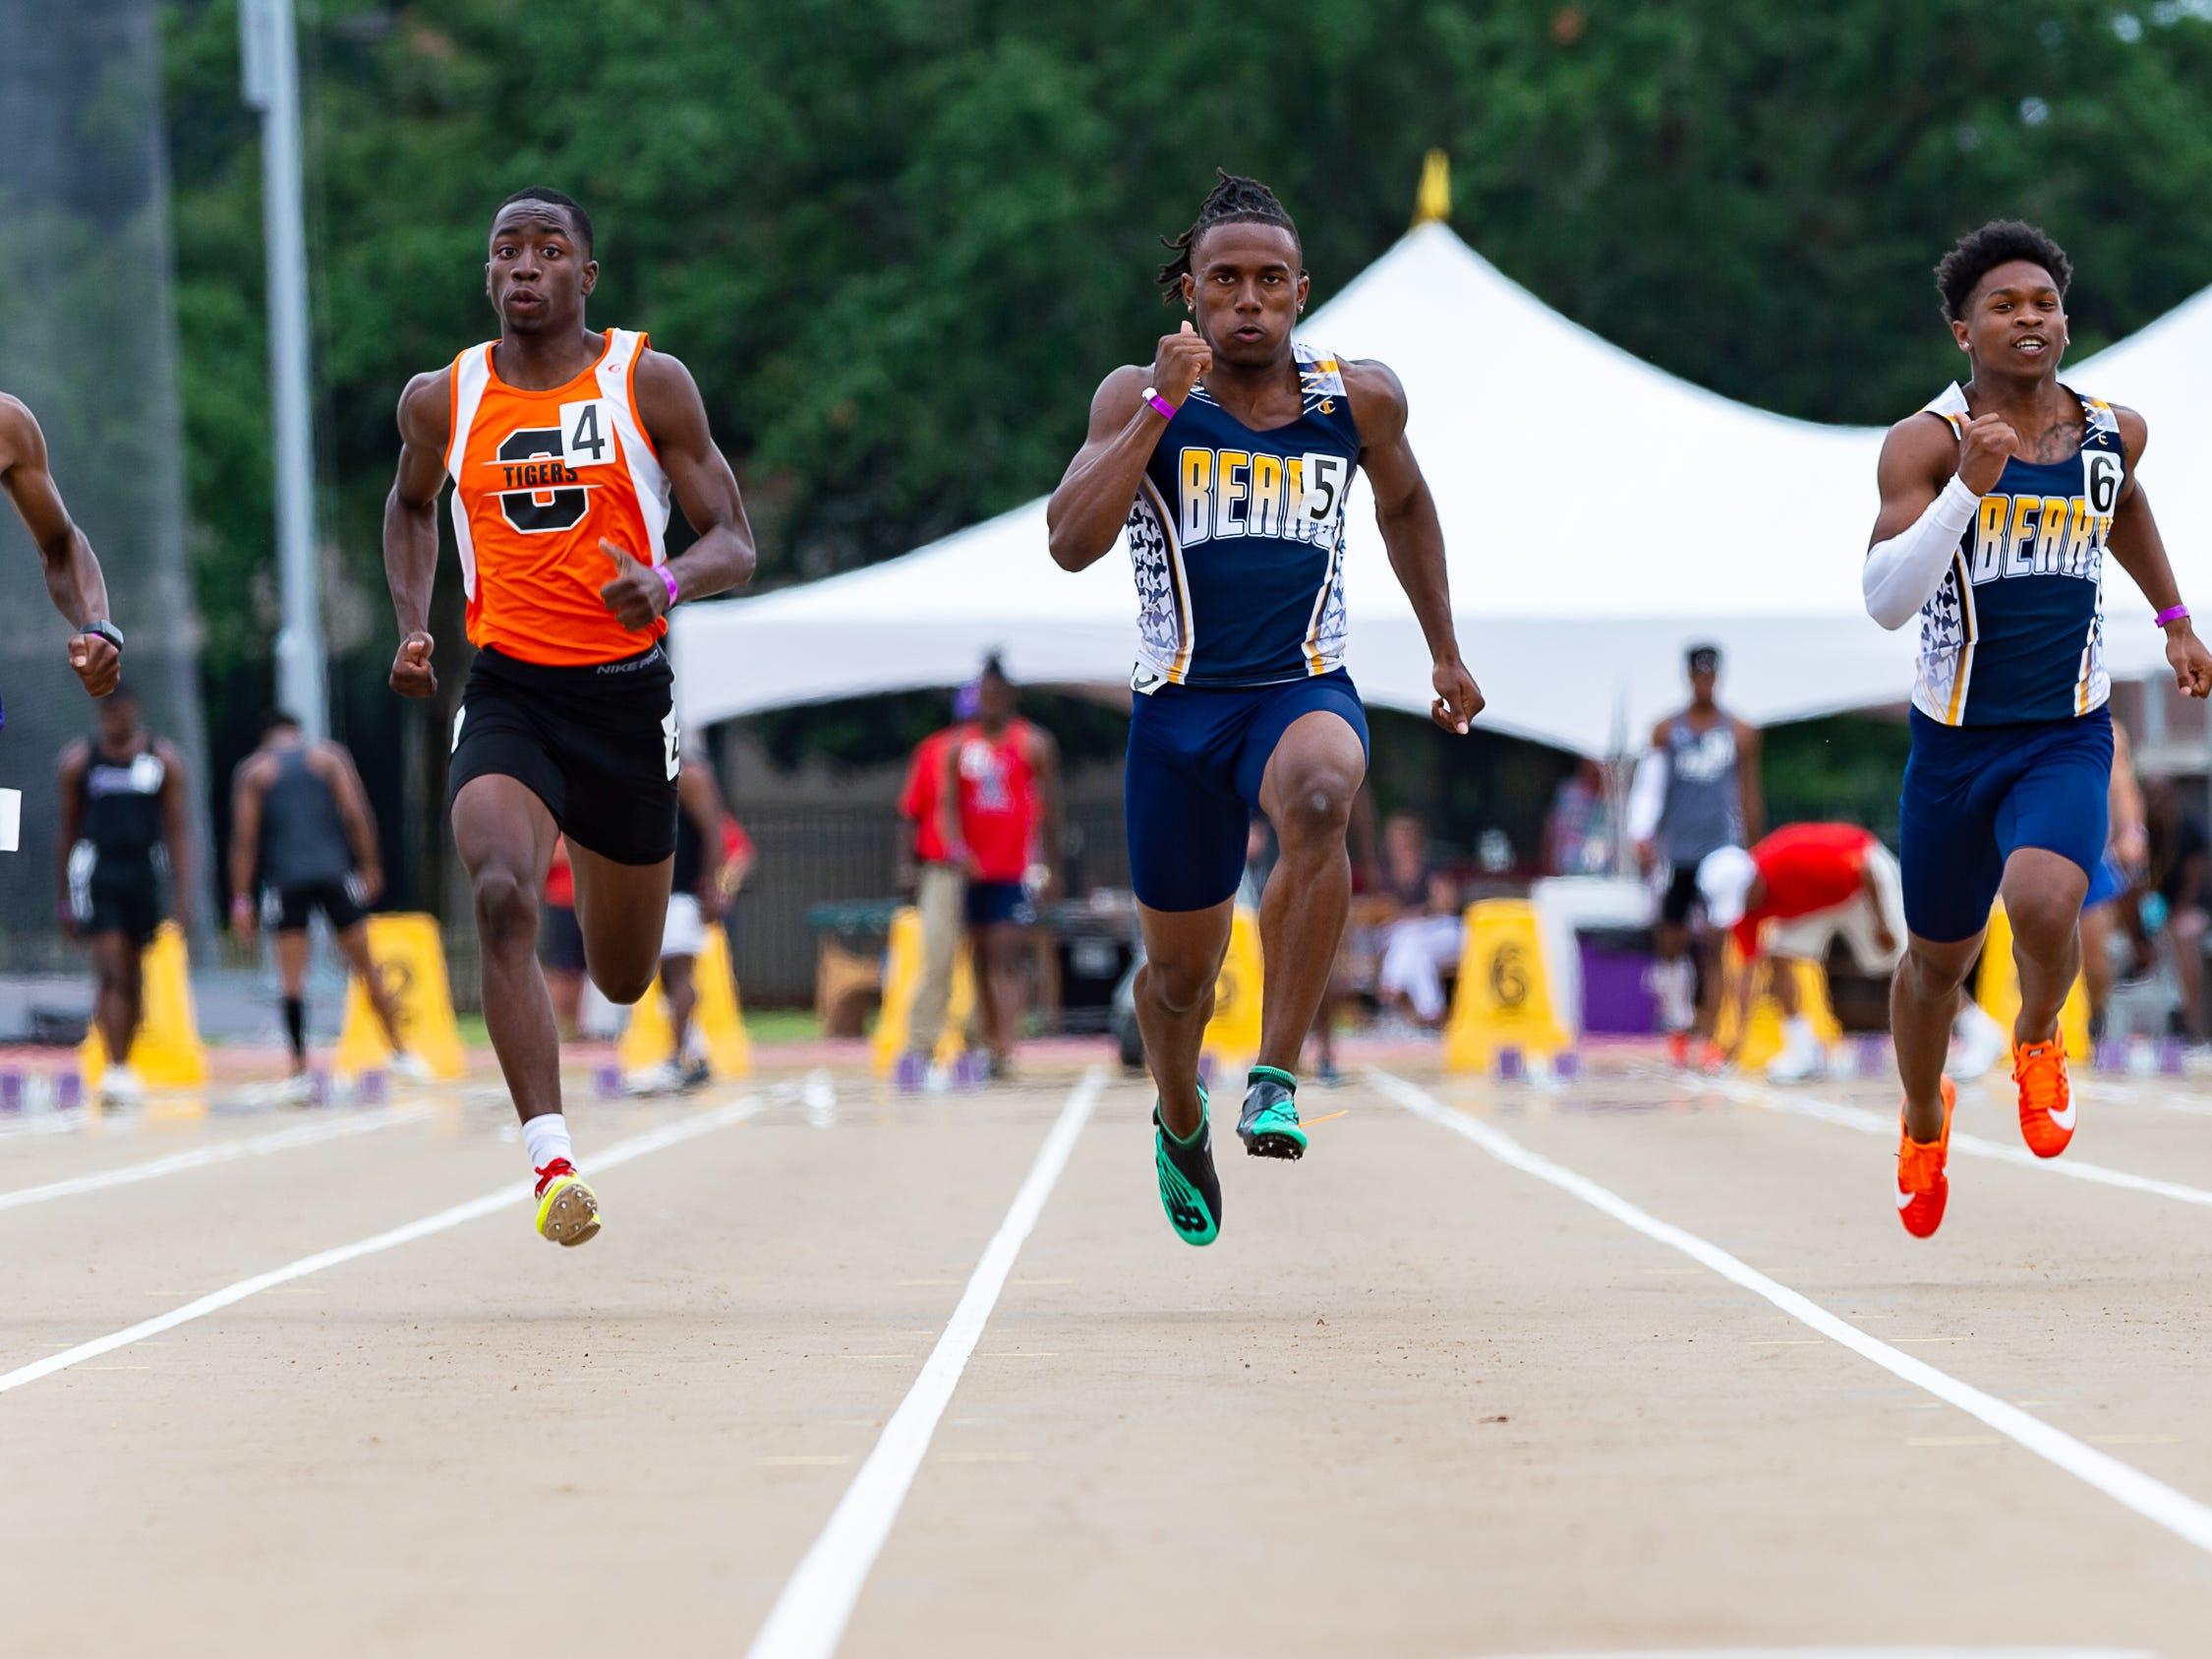 Carencro's Trejun Jones wins the boys 100m dash at The LHSAA Sate Track Meet at Bernie Moore Track in Baton Rouge, LA. Saturday, May 4, 2019.